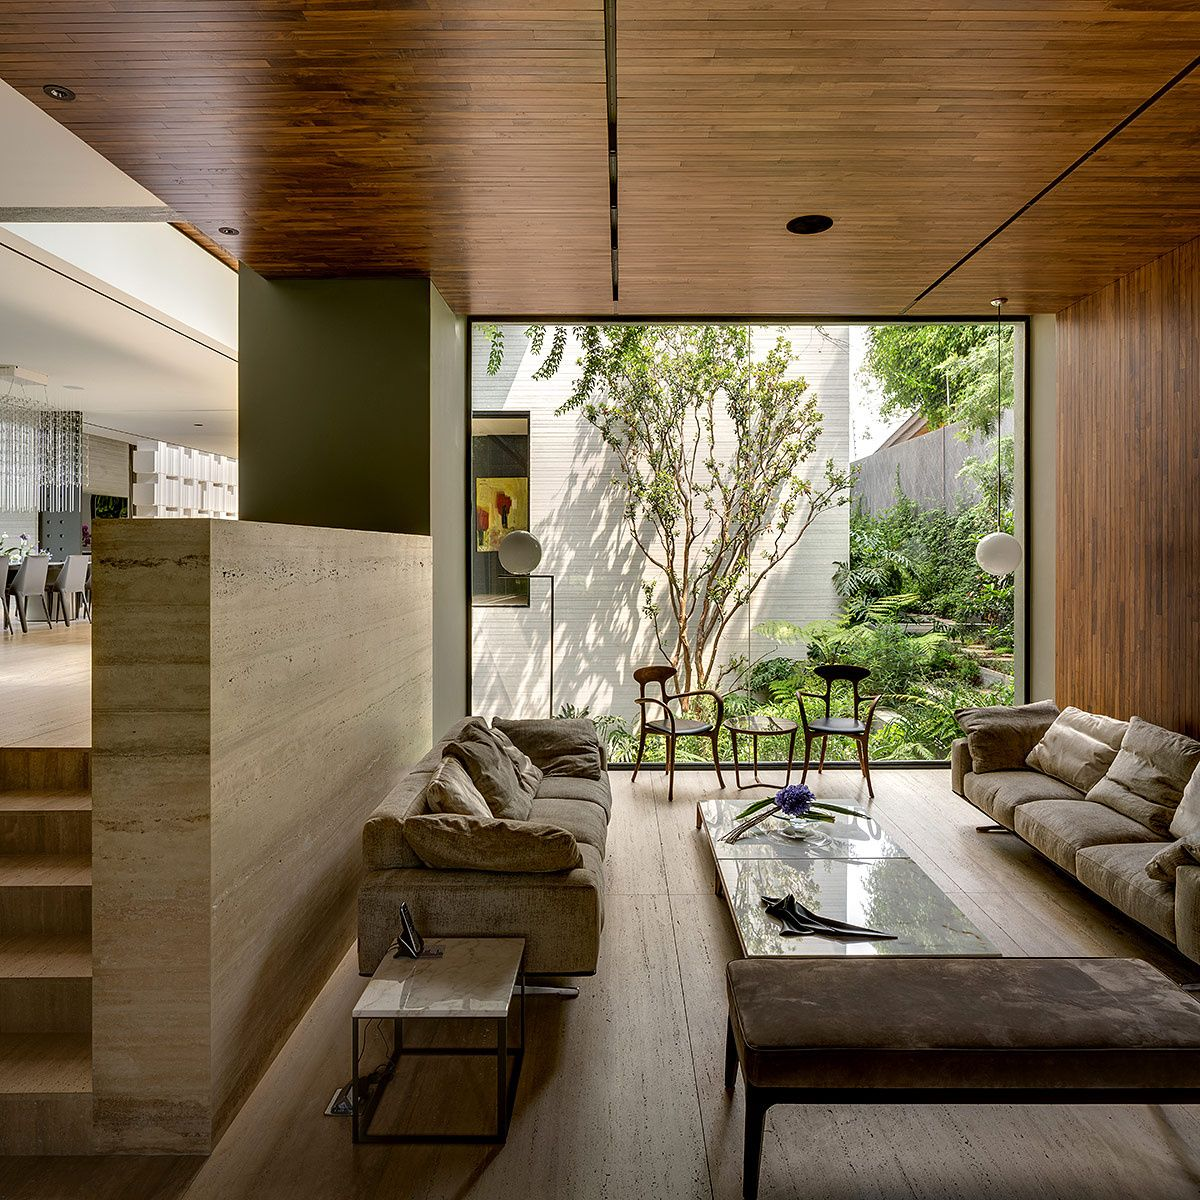 Galer A De Casa Abierta R79 12 Architecture Modernism And  # Muebles Gacela Rio Cuarto